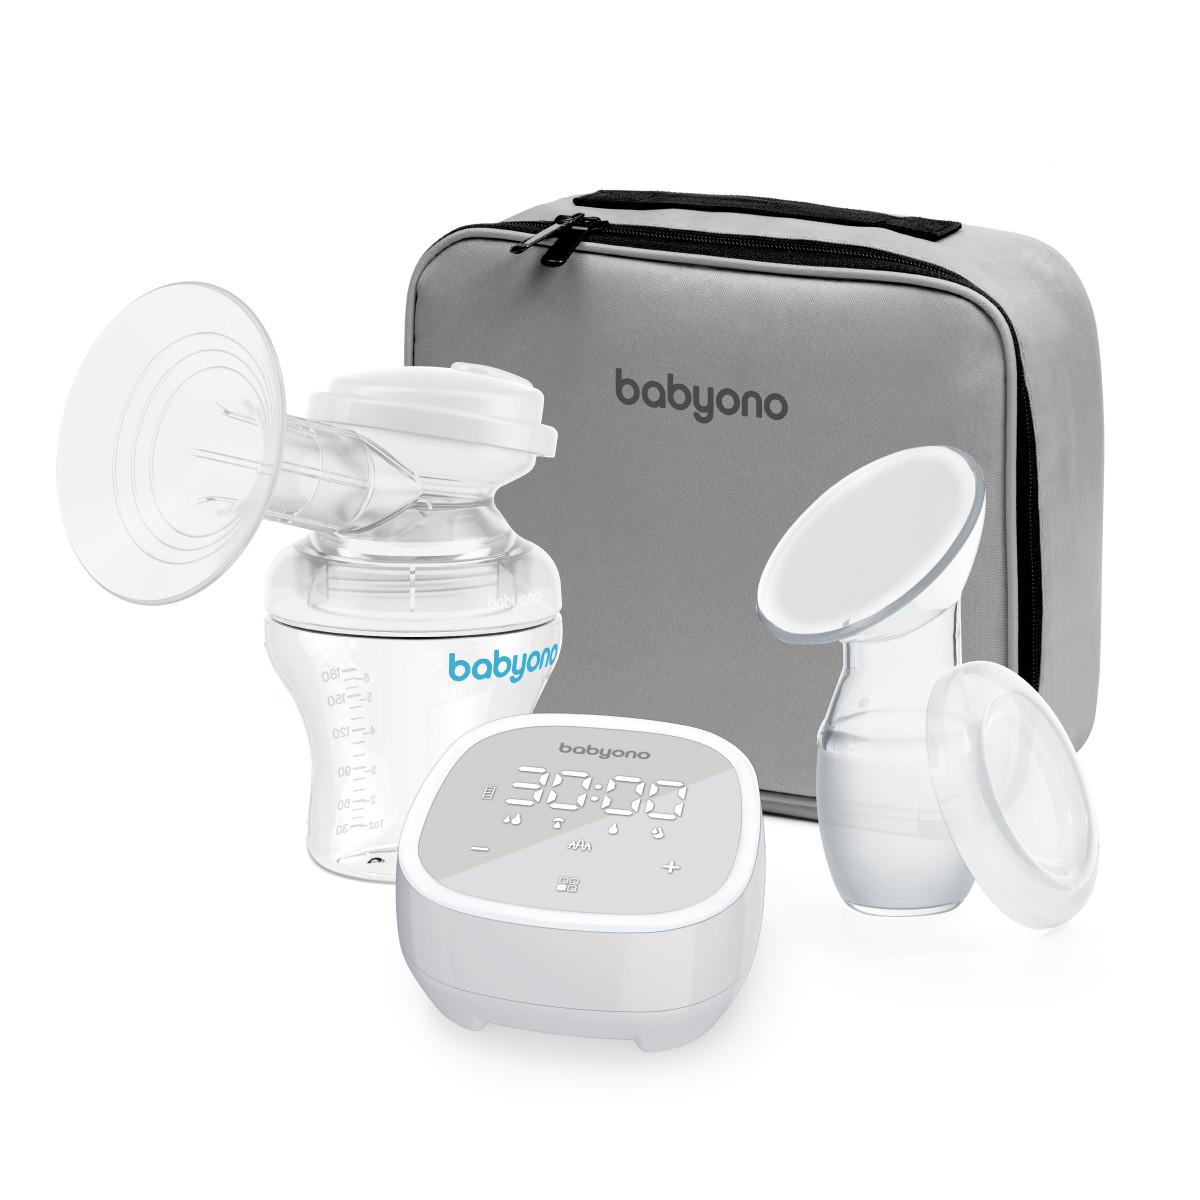 Молокоотсос электрический BabyOno INDIVIDUAL с 5 режимами